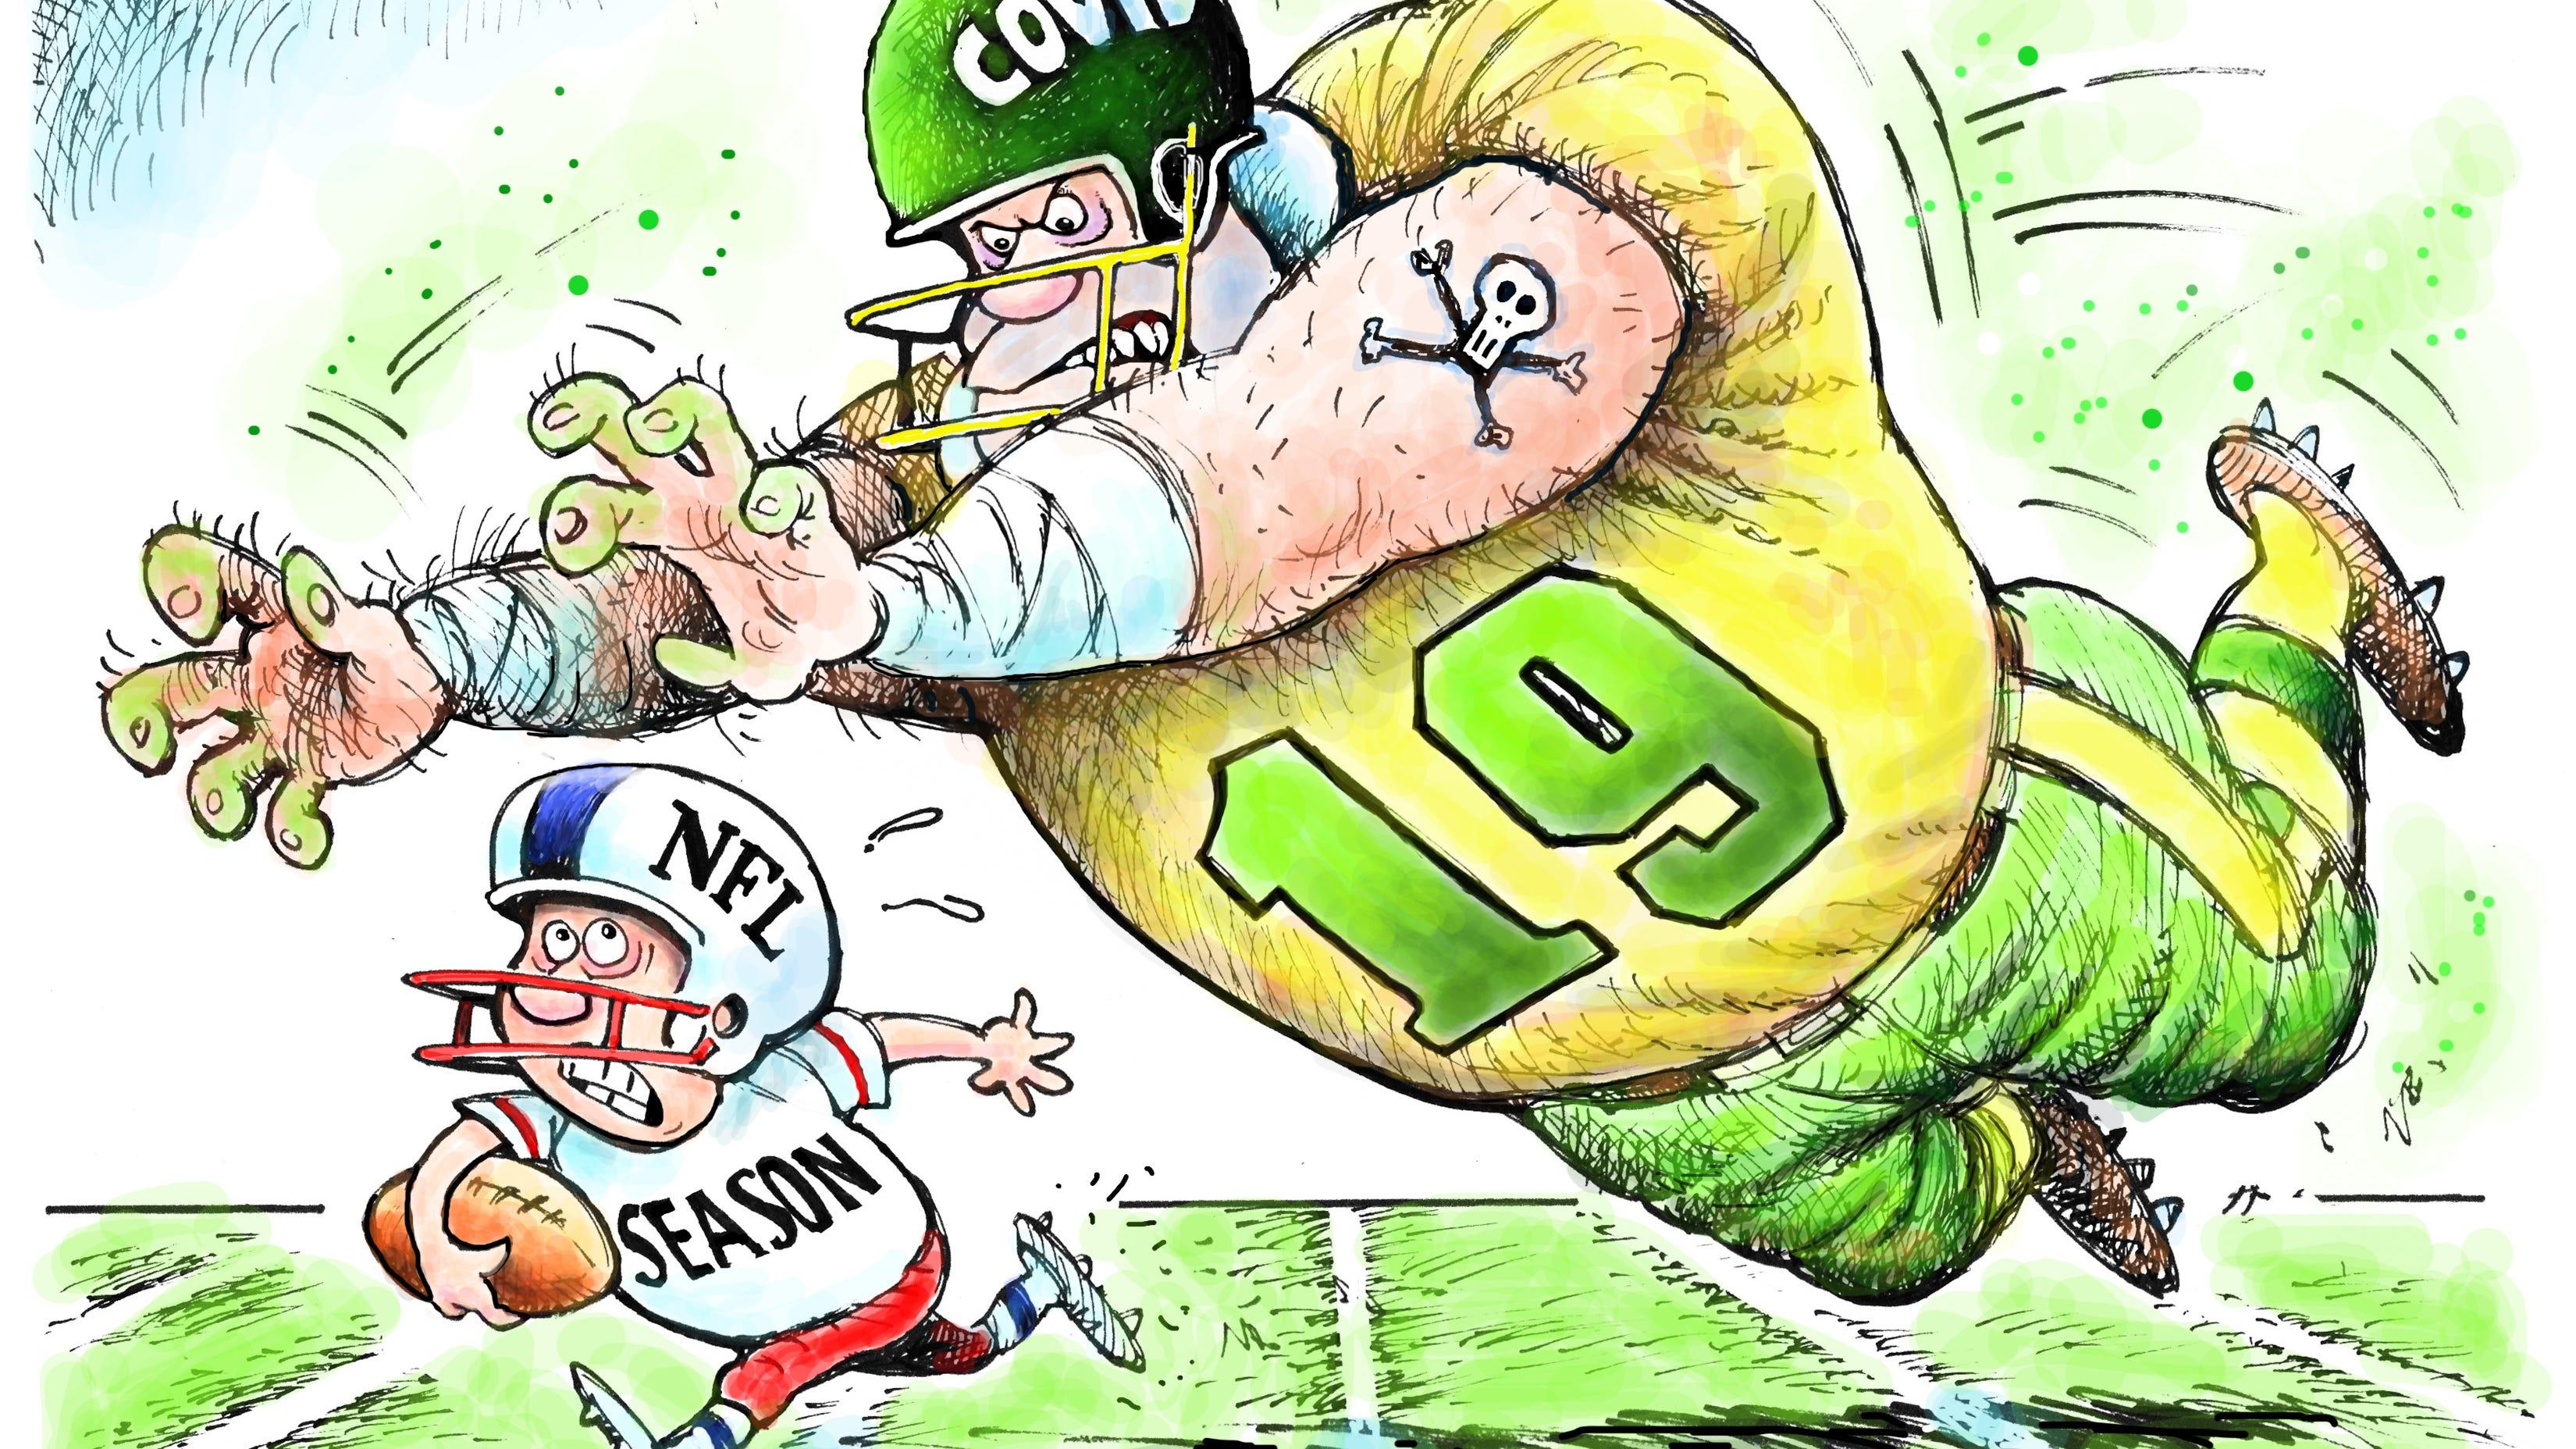 Granlund cartoon: NFL season in doubt